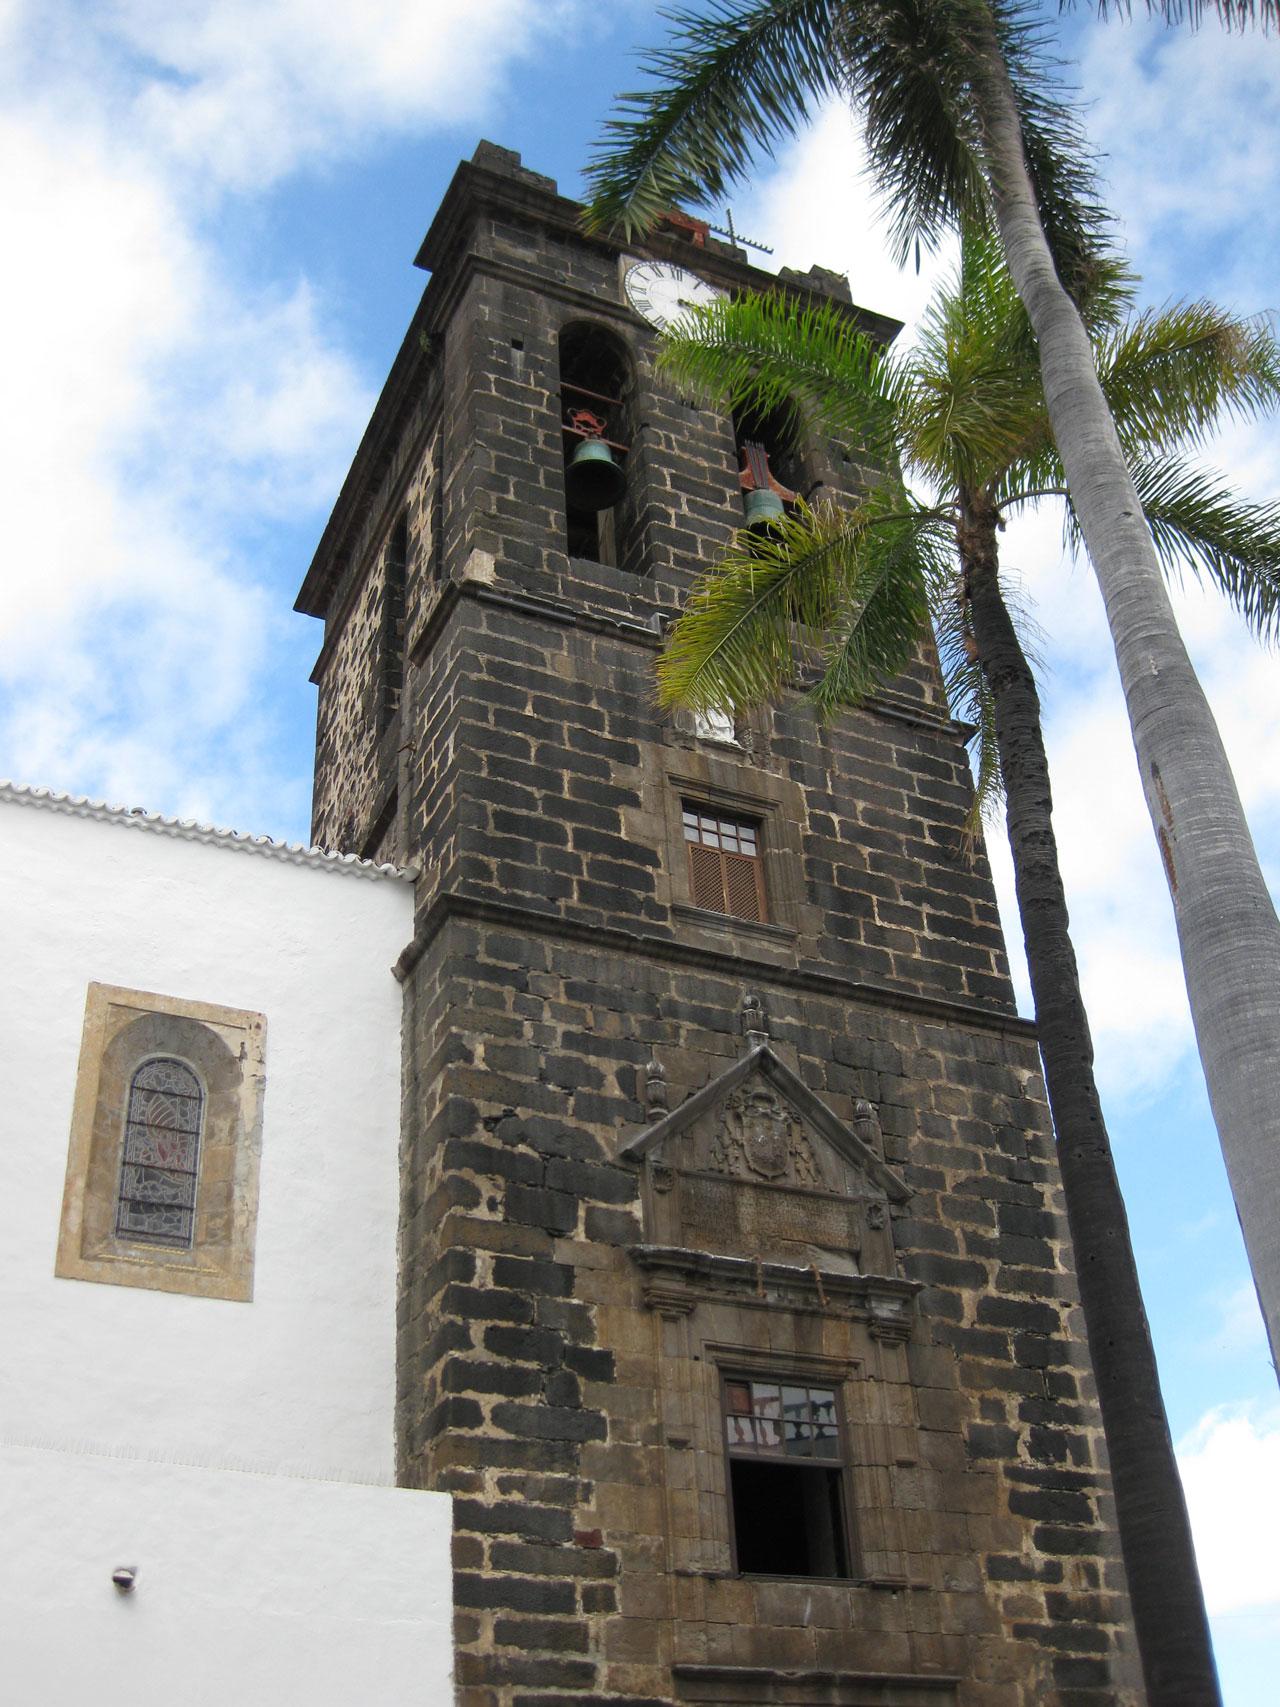 Iglesia Colegial del Divino Salvador, Plaza de España, Santa Cruz de la Palma